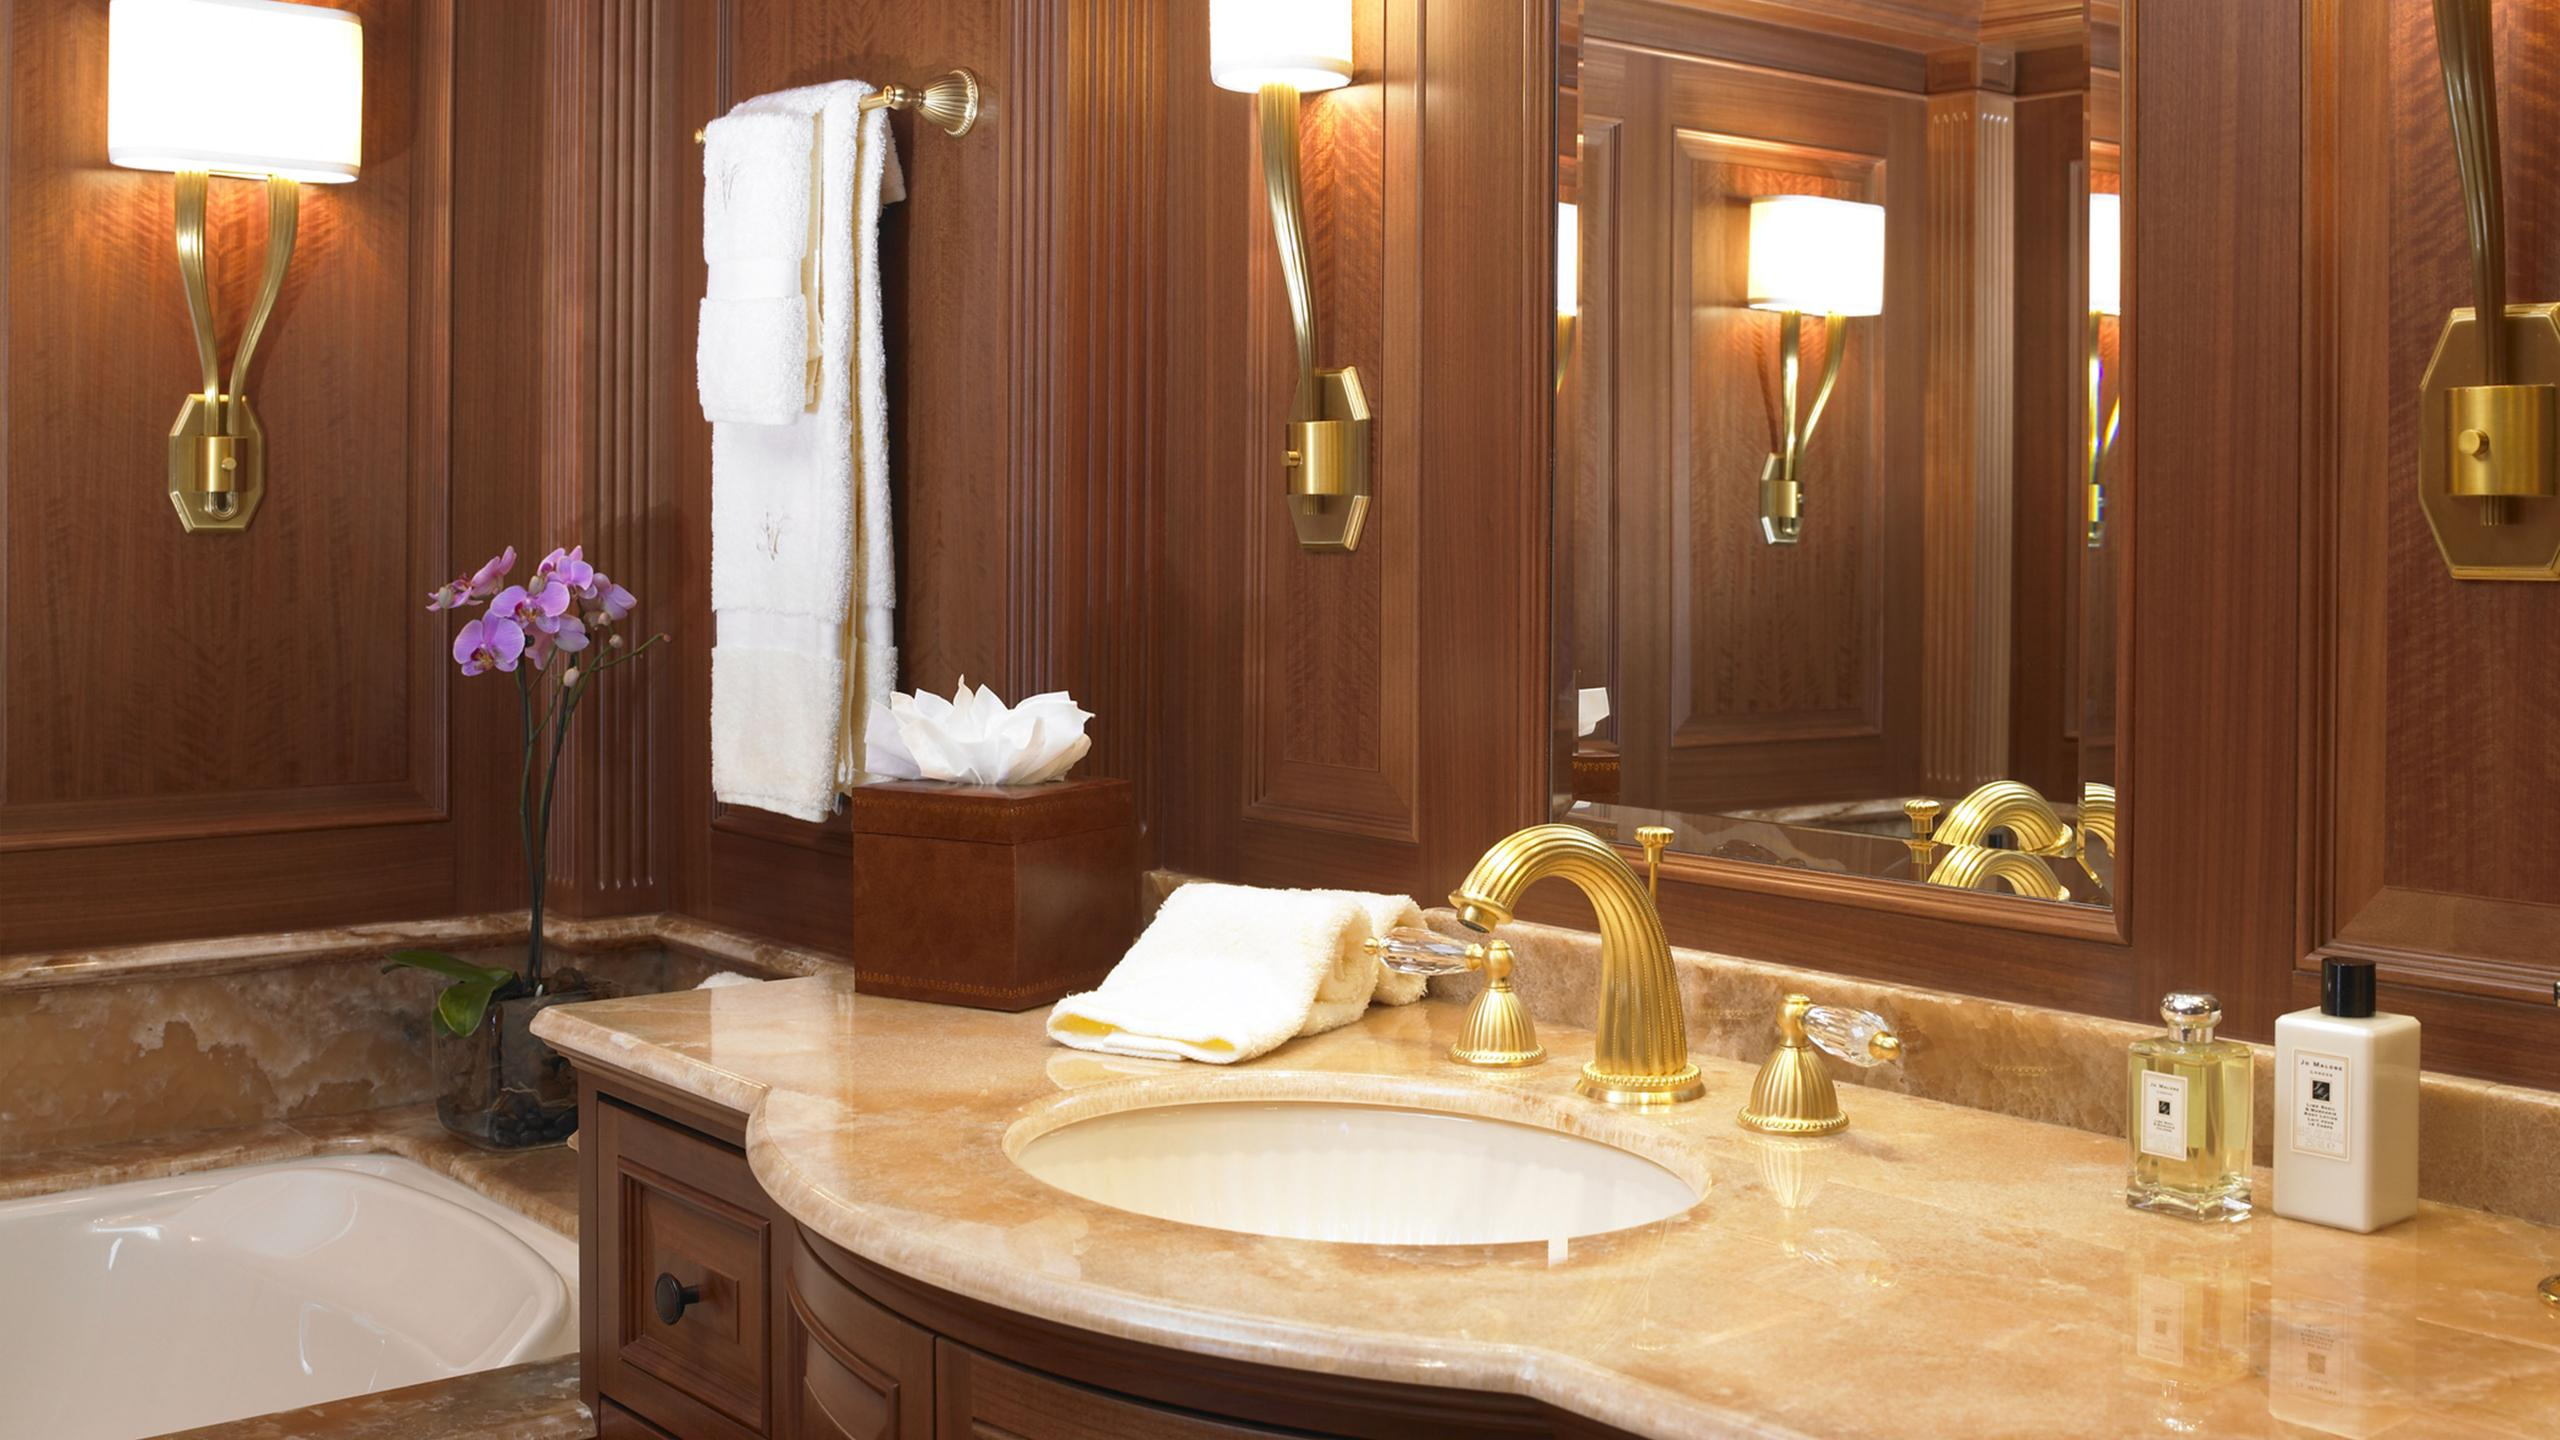 maghreb-v-yacht-bathroom